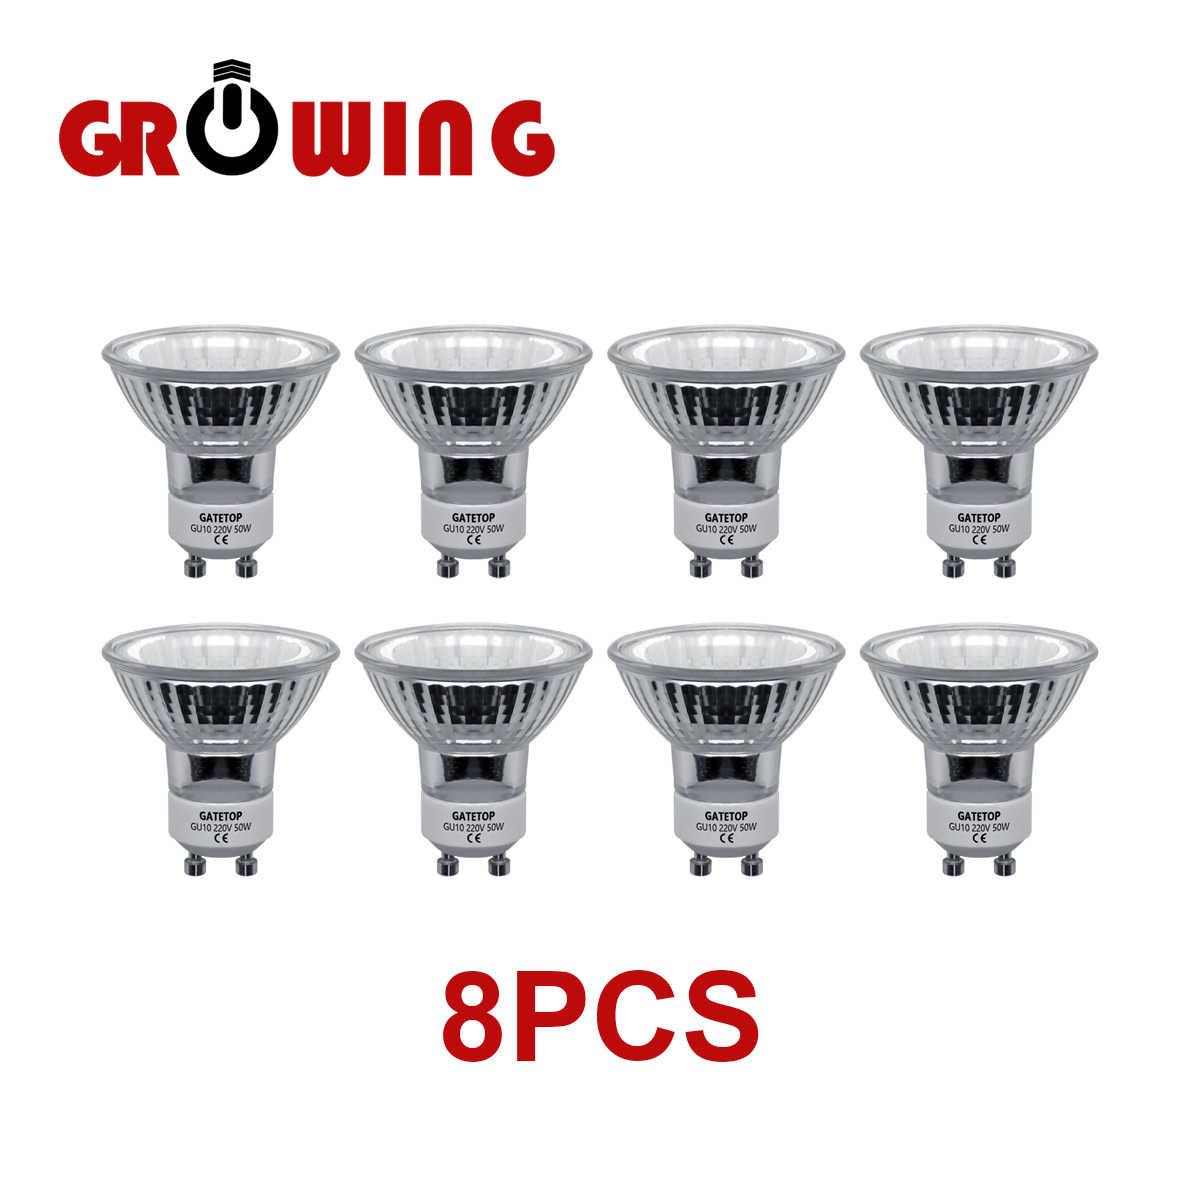 ZMISHIBO 12Pcs/Lot Halogen GU12 Bulb 12V 12W 12W Diameter 12MM MR12 Clear  Glass With Cover Dimmable Warm White 12K Spot Lamp